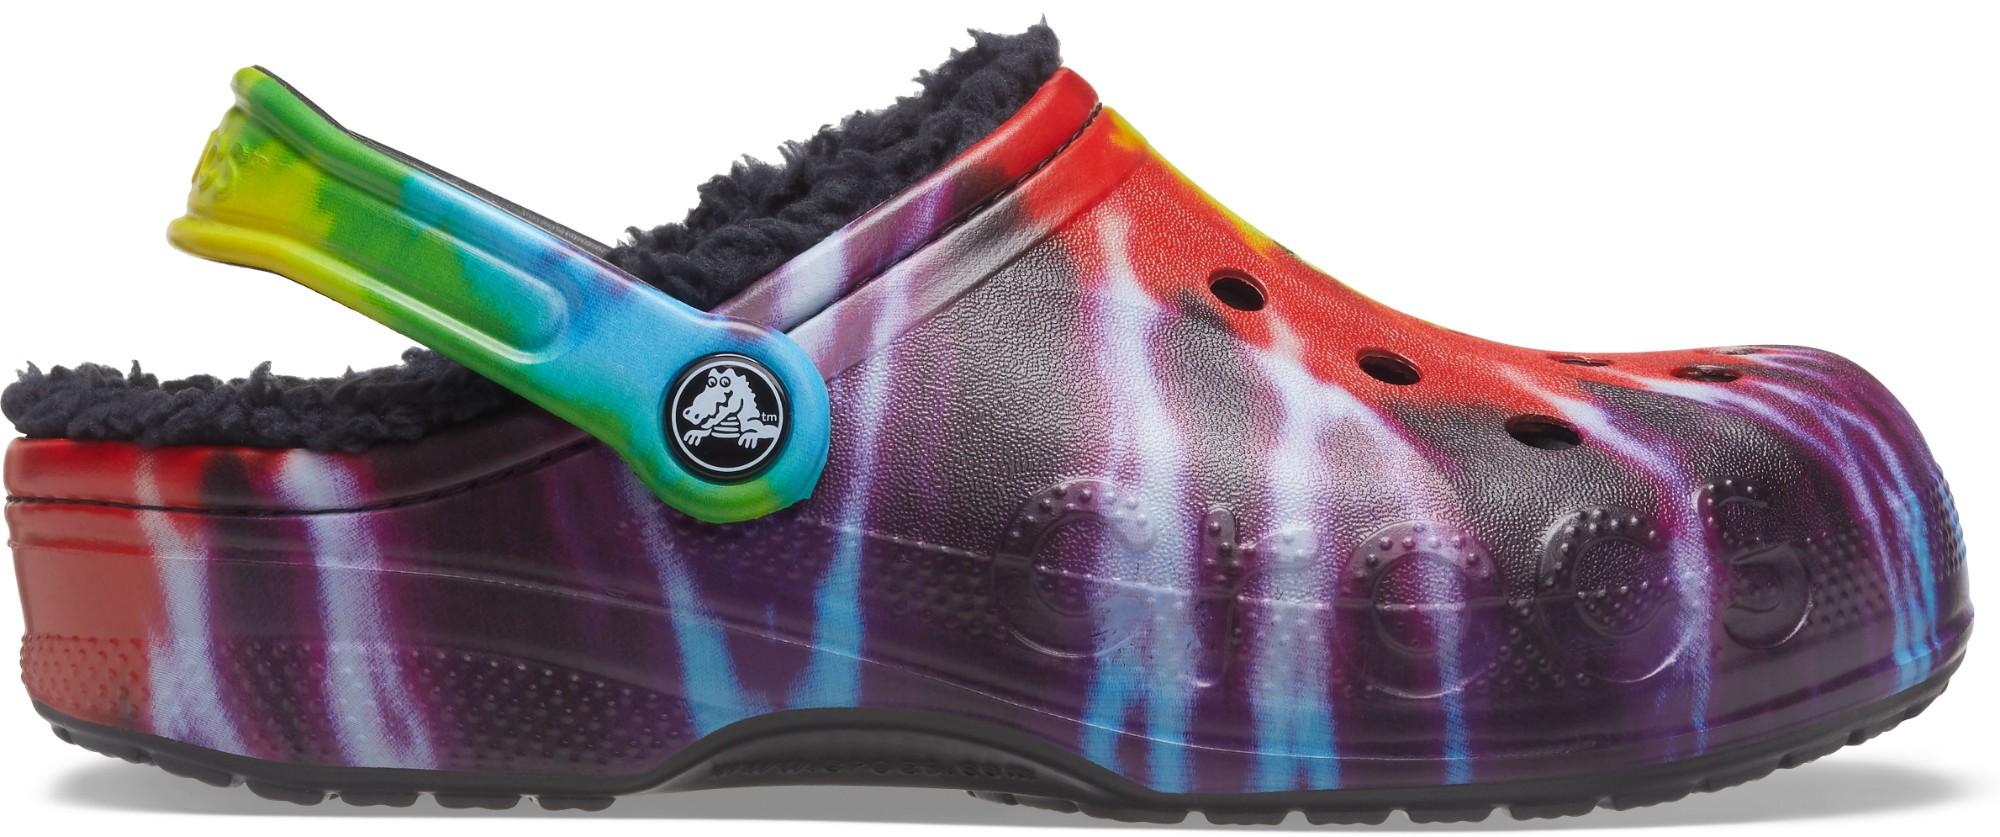 Crocs™ Baya Lined Tie Dye Graphic Clog Multi/Black 41